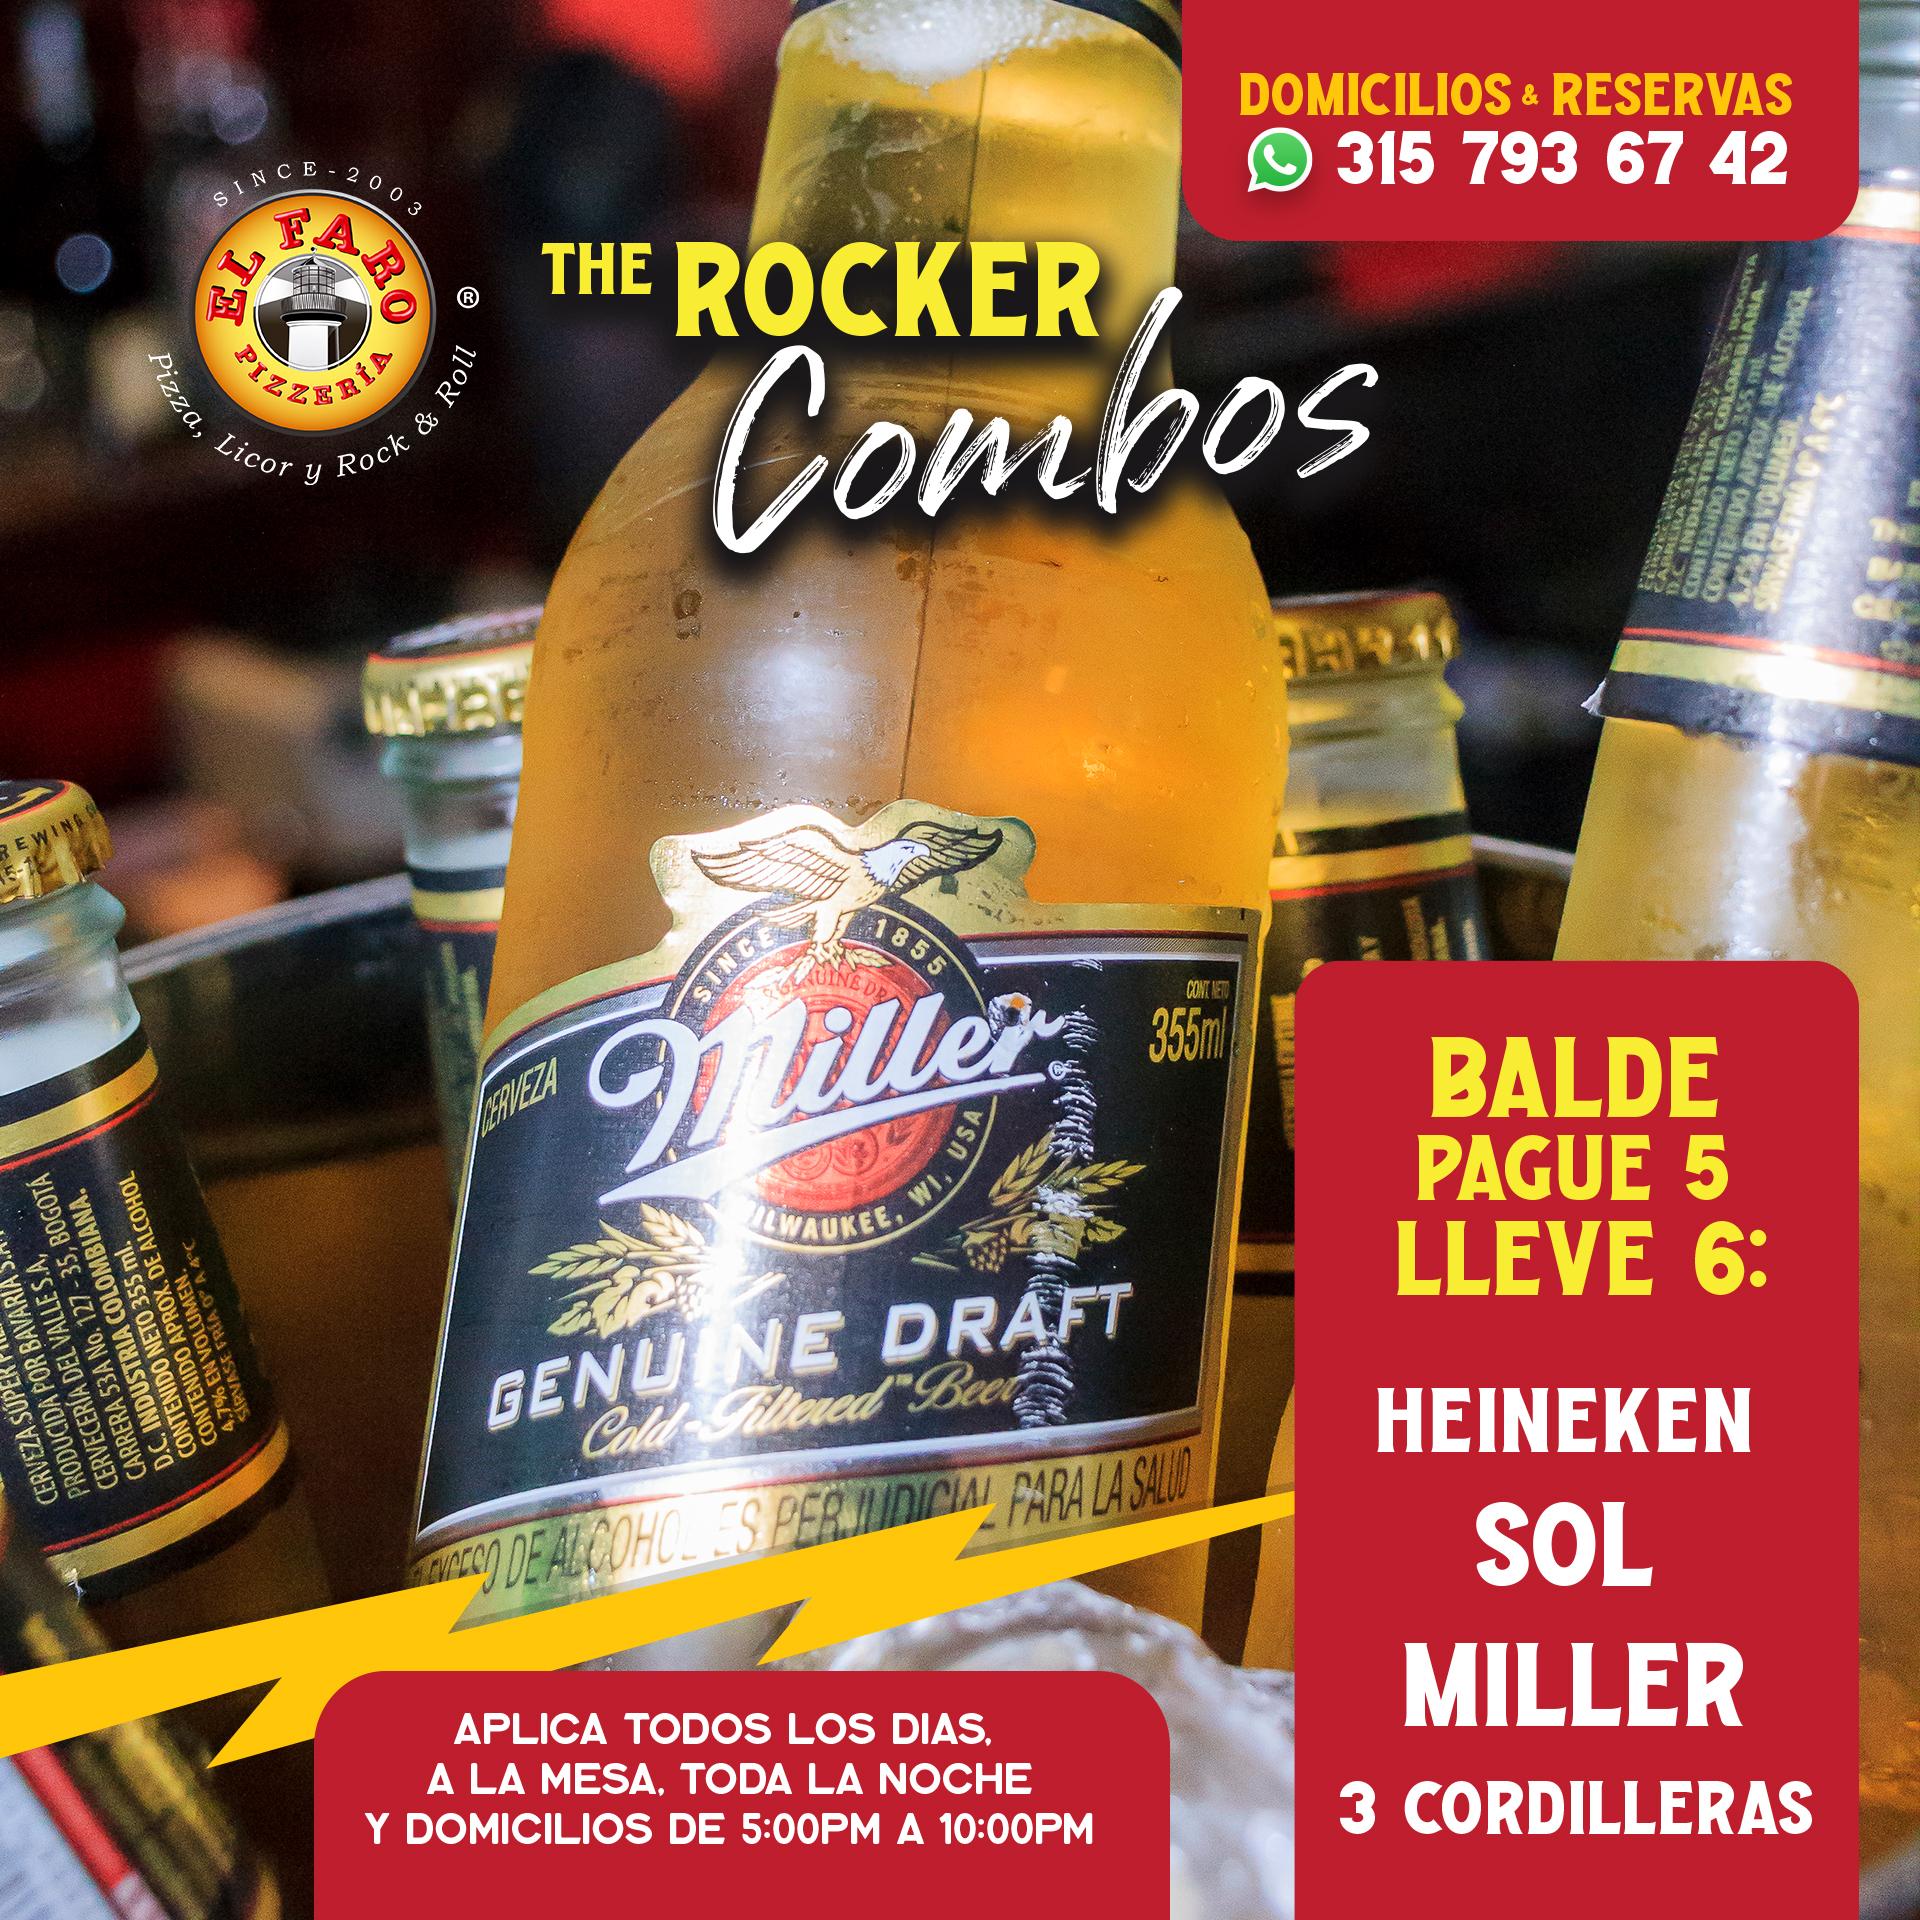 10---ROCKER-COMBO---BALDE-PAGUE-5-LLEVE-6---SQ